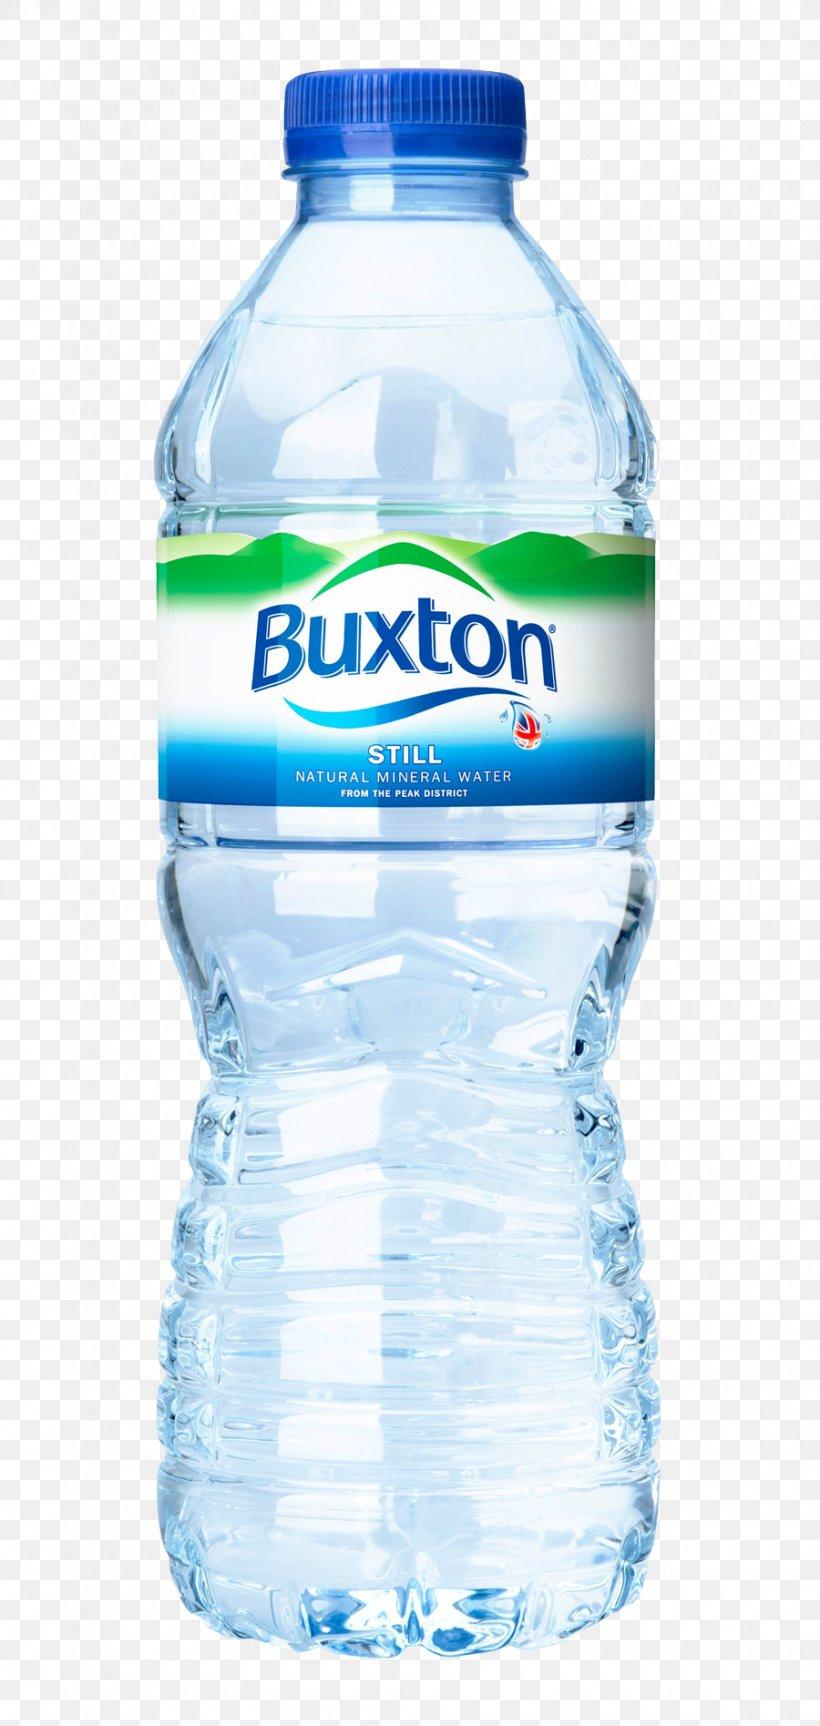 Soft Drink Water Bottle Bottled Water Mineral Water, PNG, 900x1895px, Soft Drink, Bottle, Bottled Water, Carbonated Water, Distilled Water Download Free